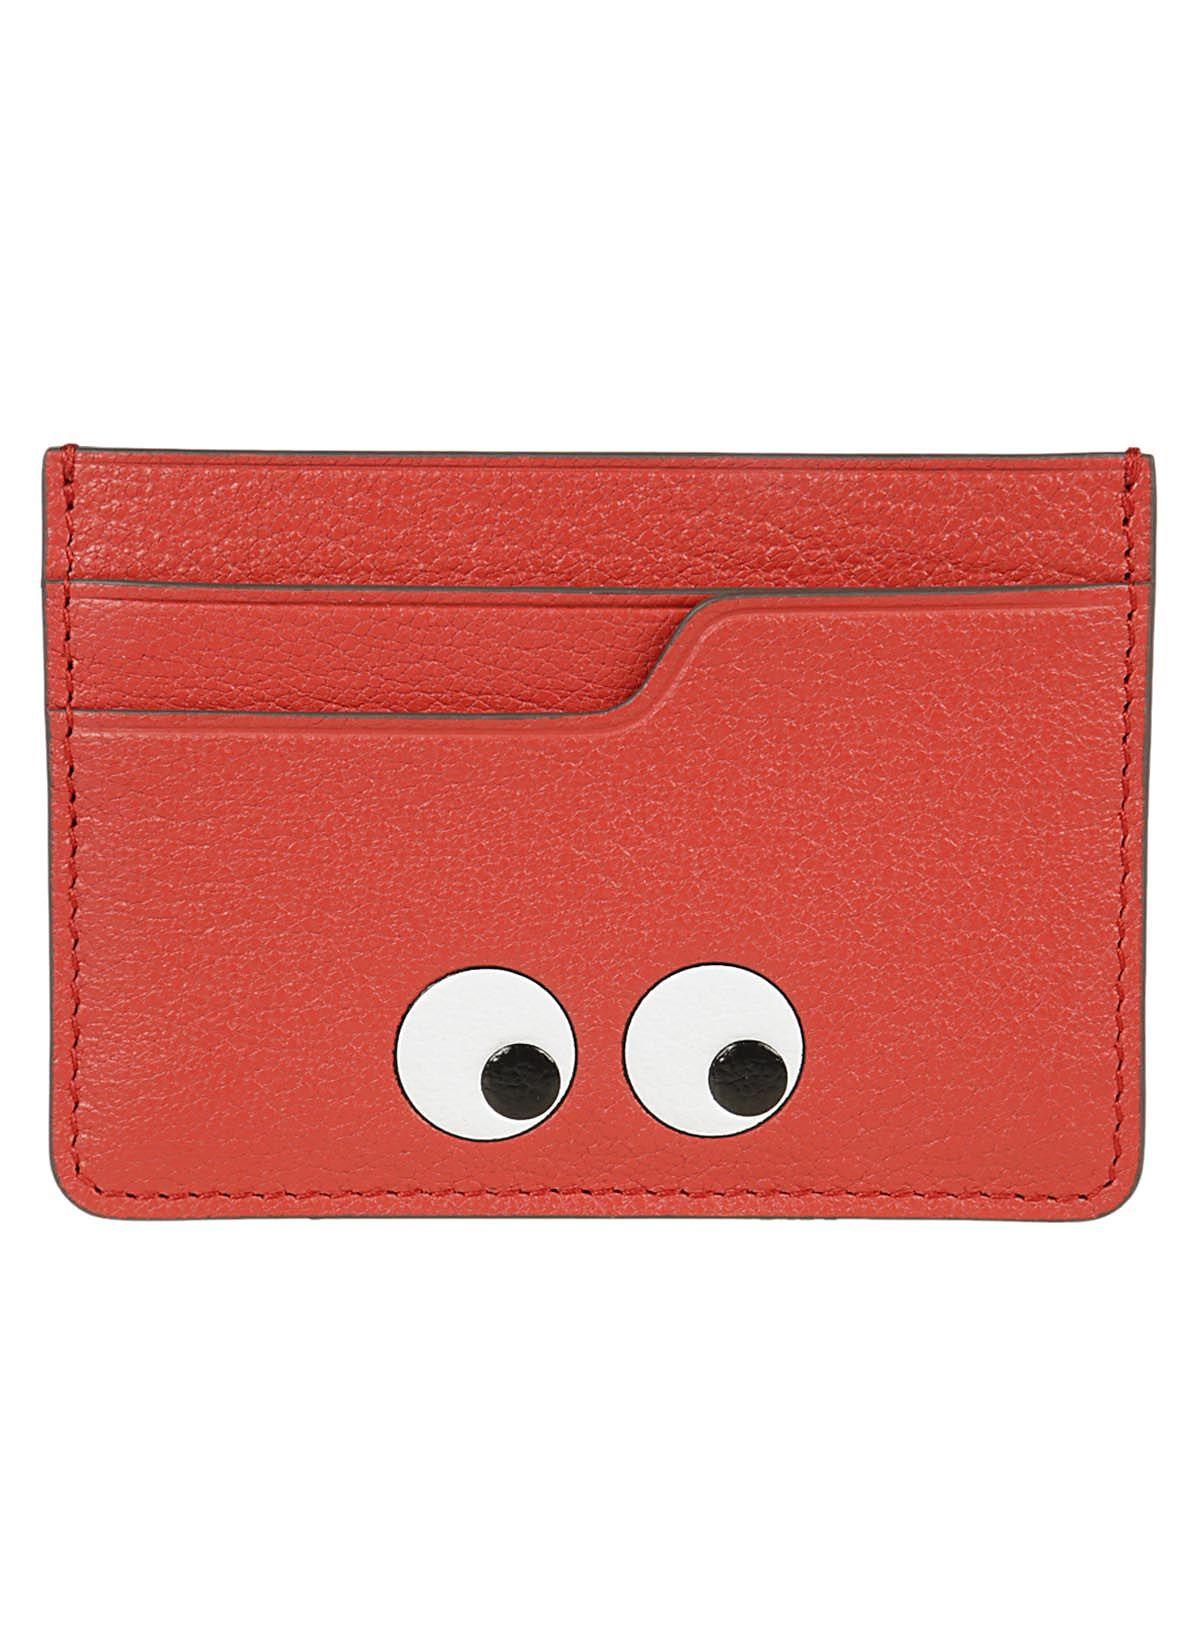 Anya Hindmarch Anya Hindmarch Eyes Card Case